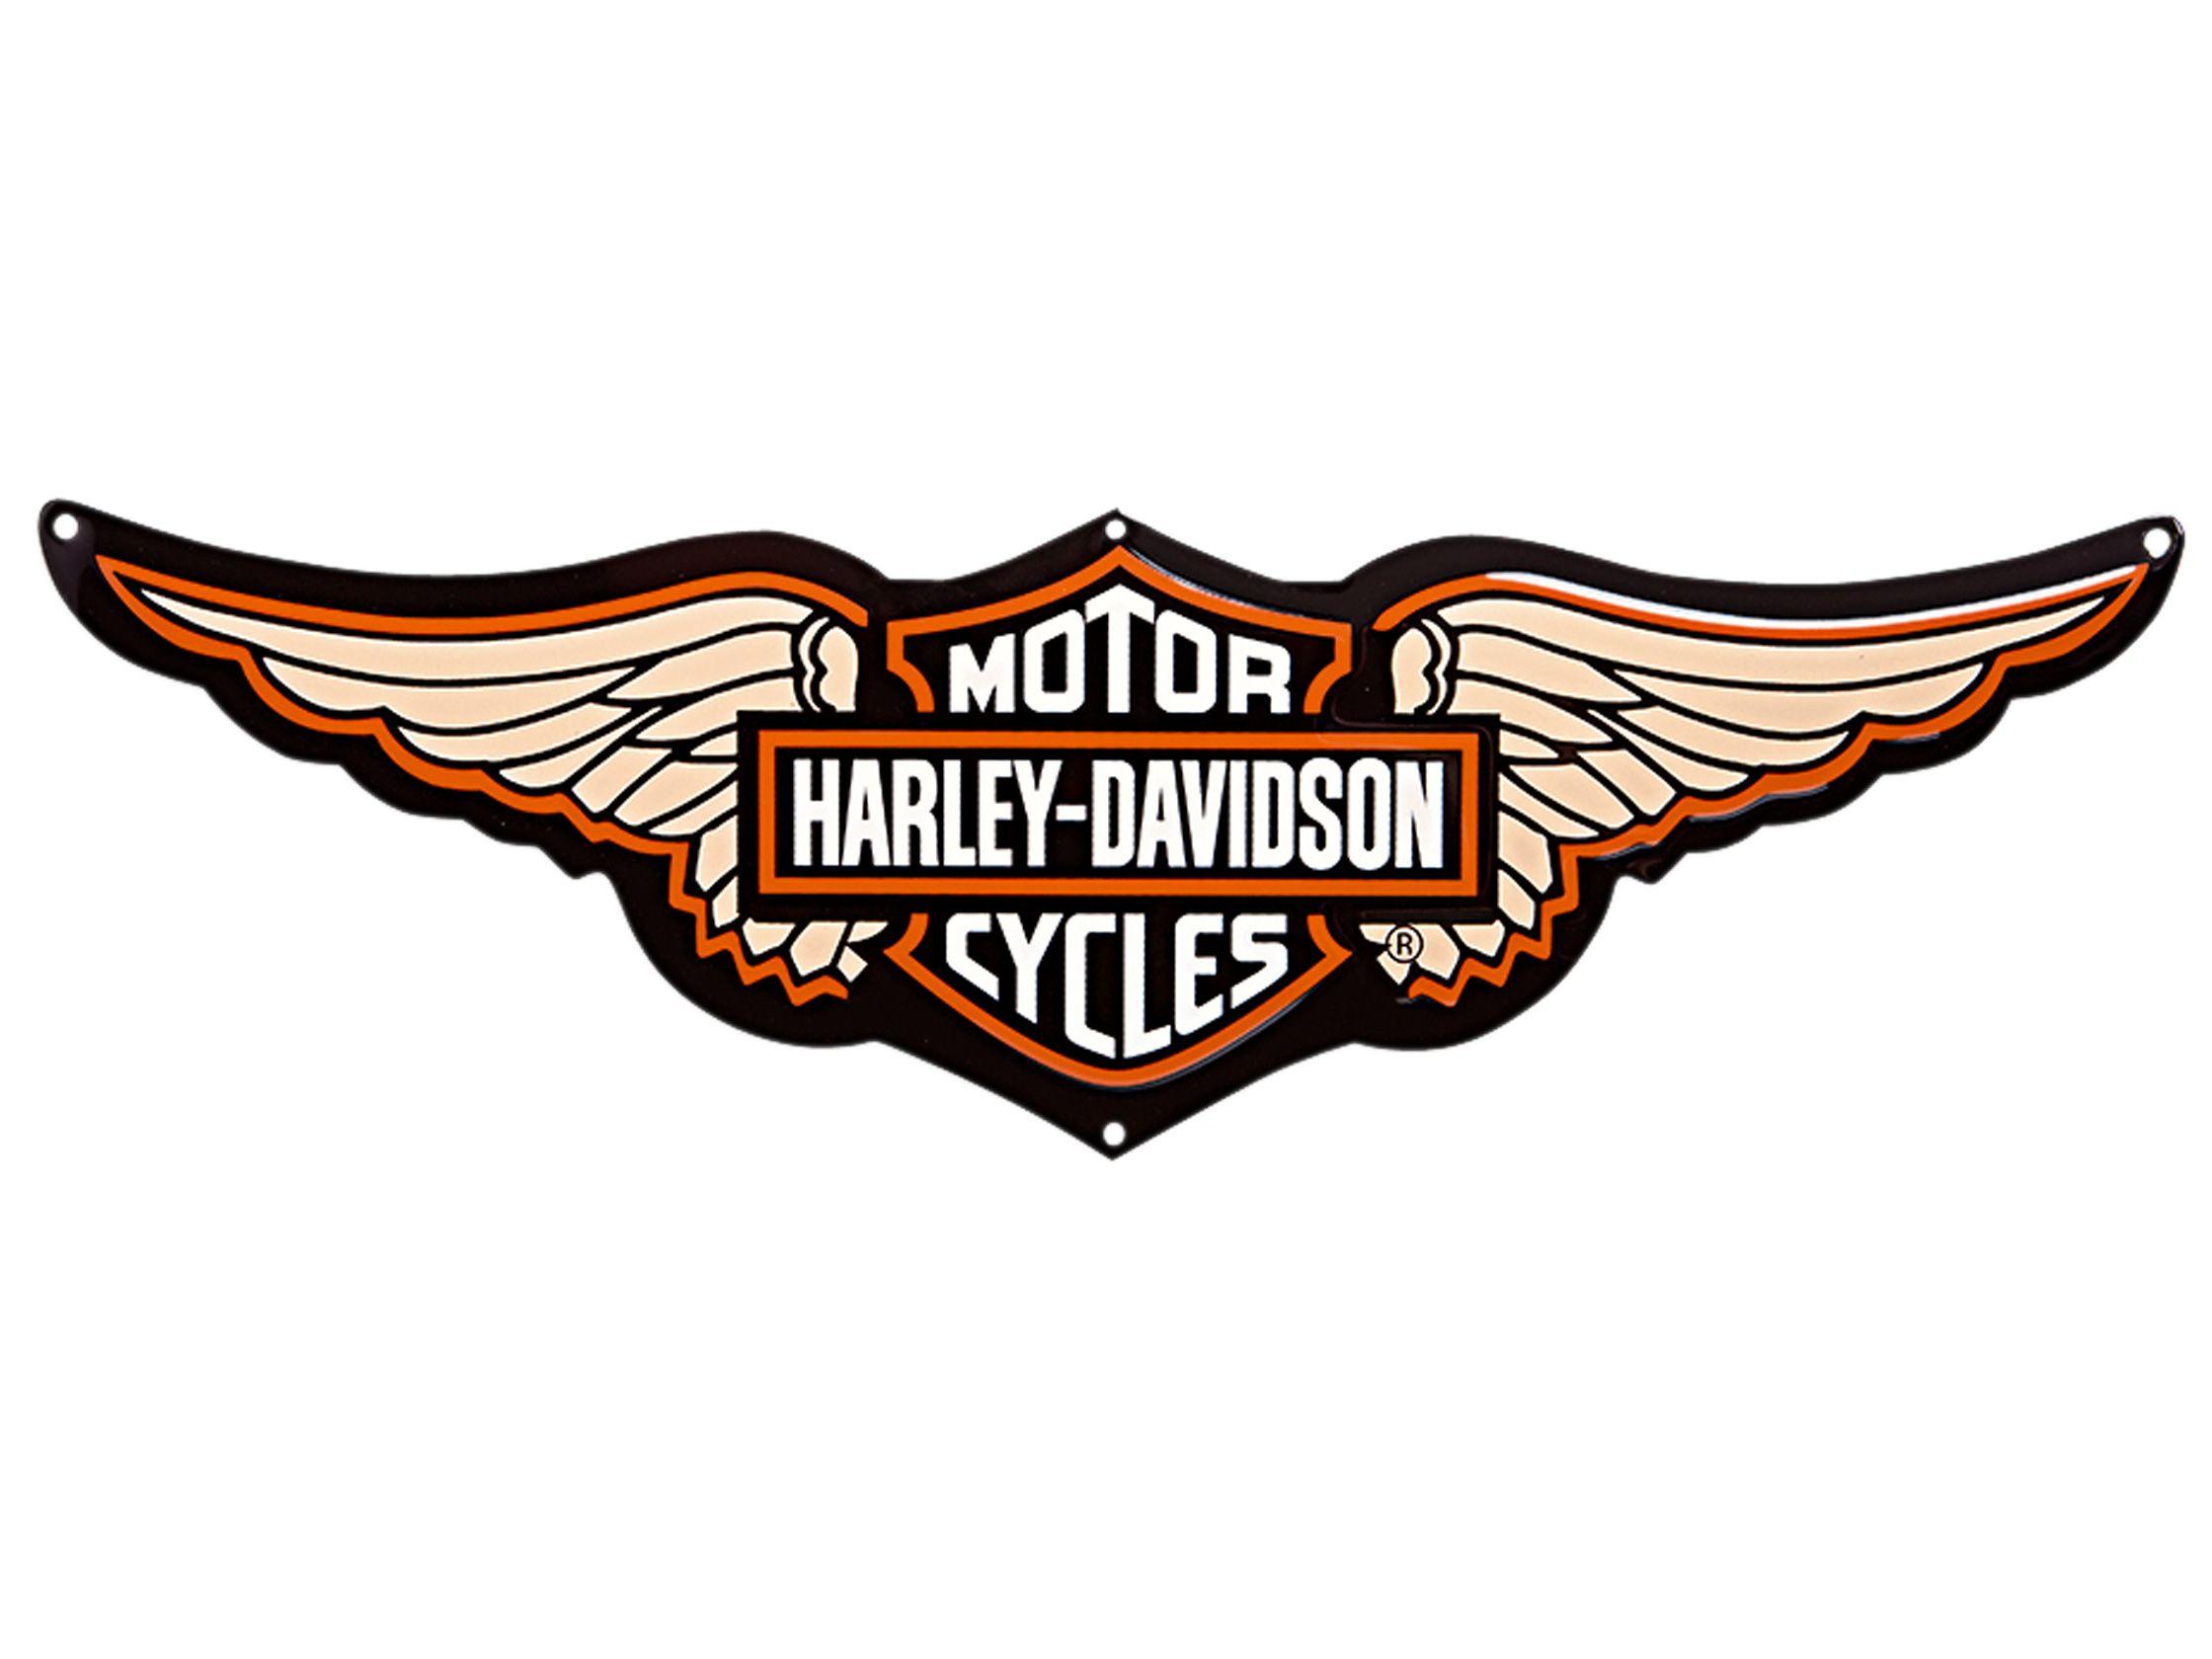 Harley Davidson Log: Harley Davidson Logo Images Wallpaper HD #3444 Wallpaper